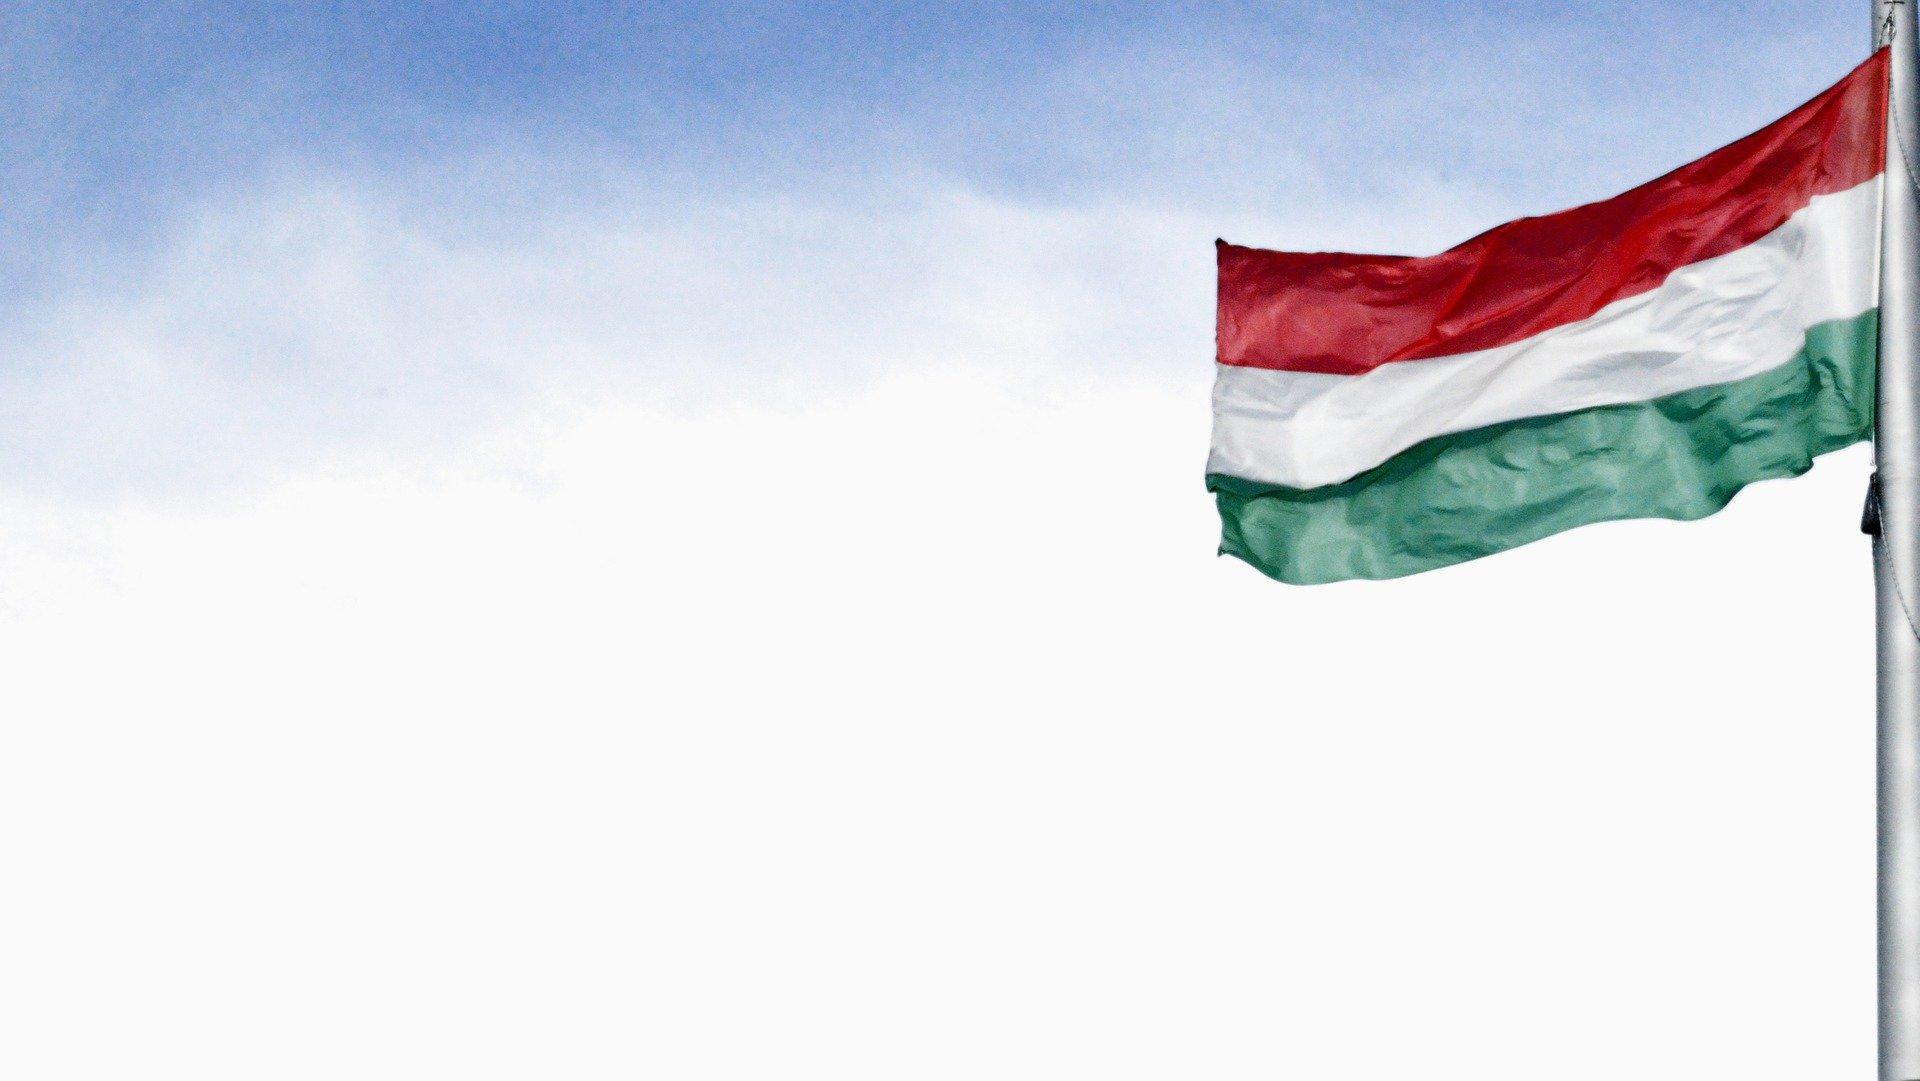 hungarian-flag-1344048_1920.jpg